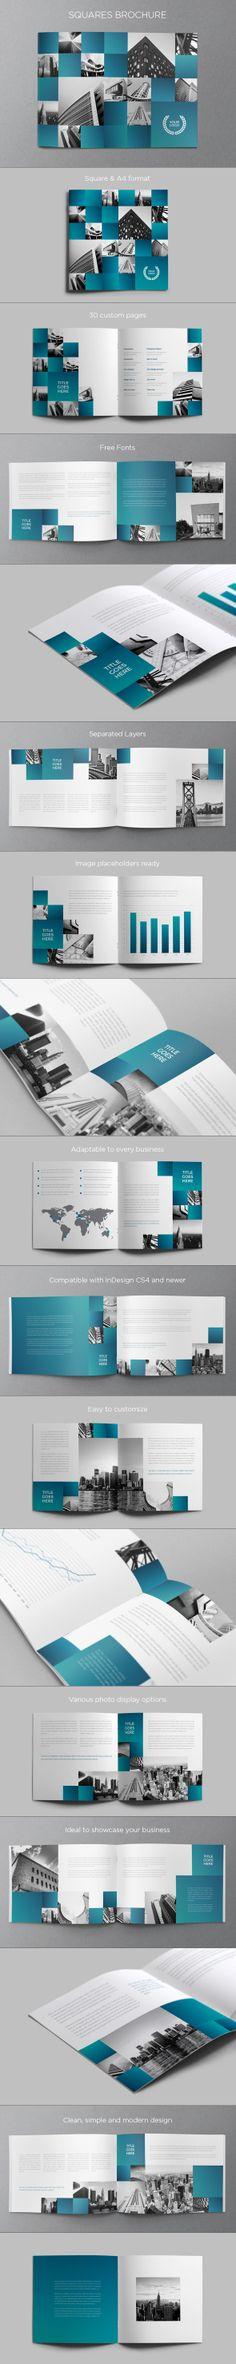 Architecture Squares Brochure. Download here: http://graphicriver.net/item/architecture-squares-brochure/5993725?ref=abradesign #design #brochure